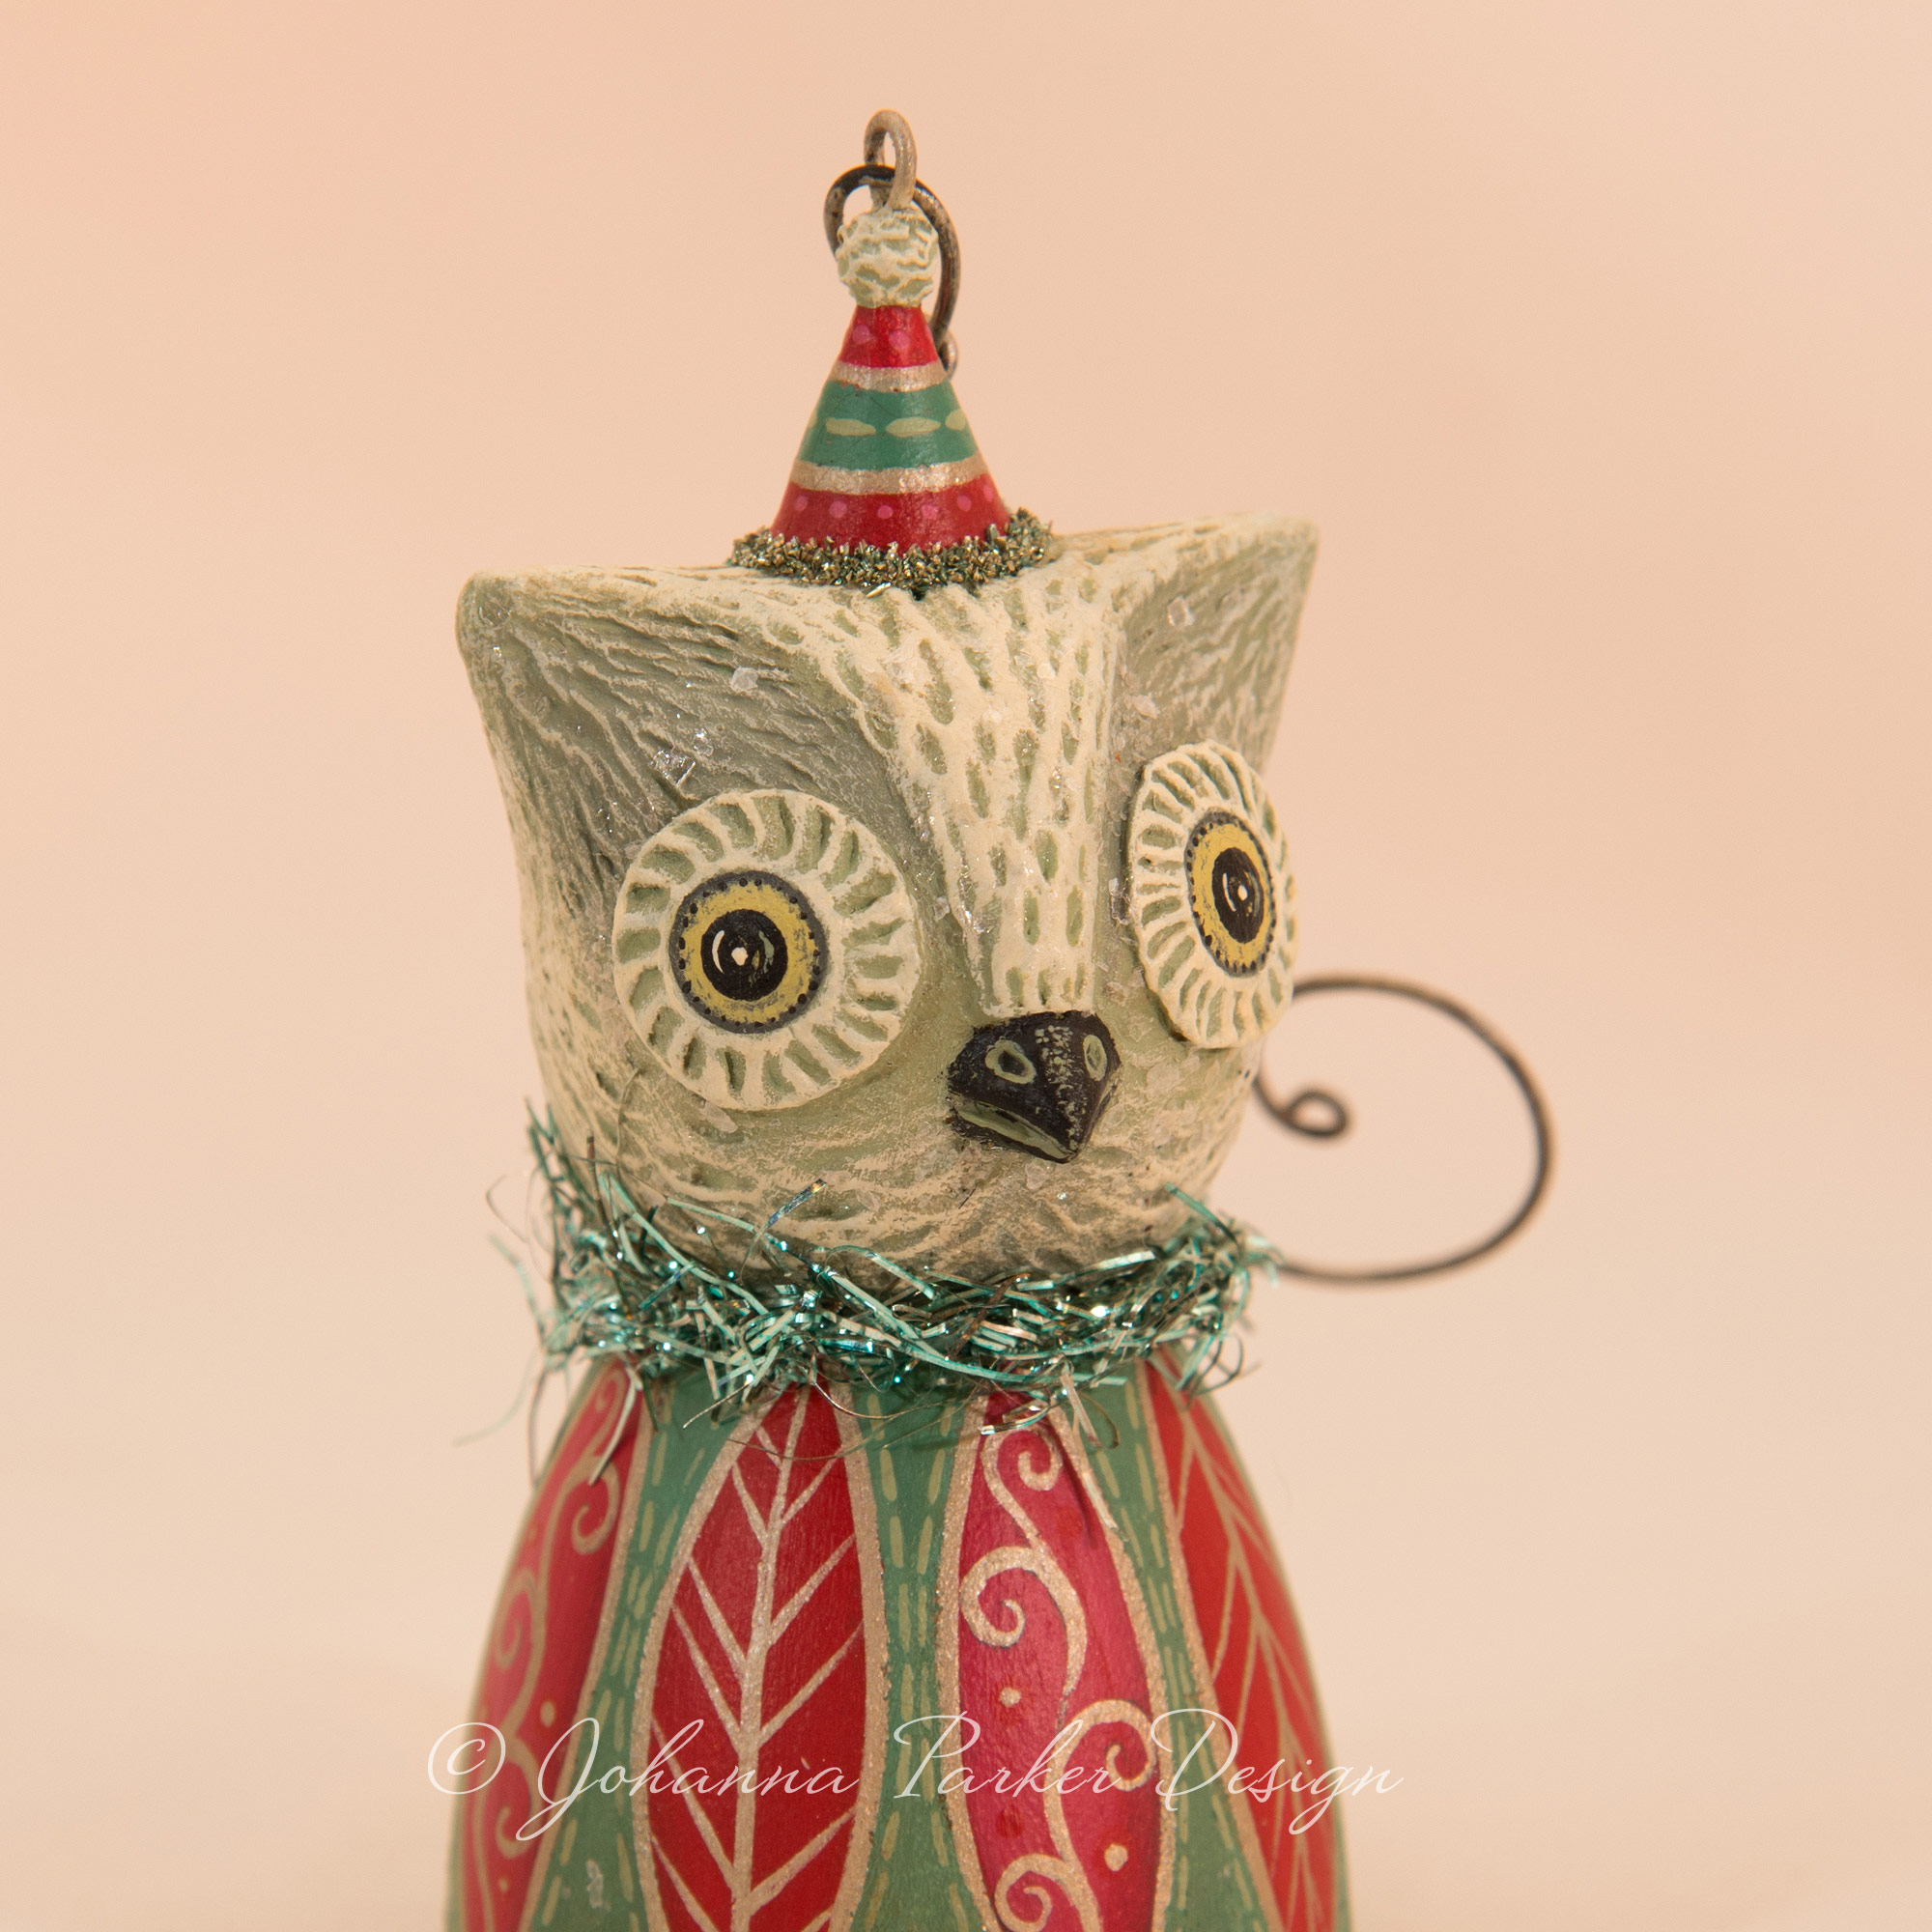 Johanna-Parker-Owl-Feathers-Bell-Ornament-2.jpg